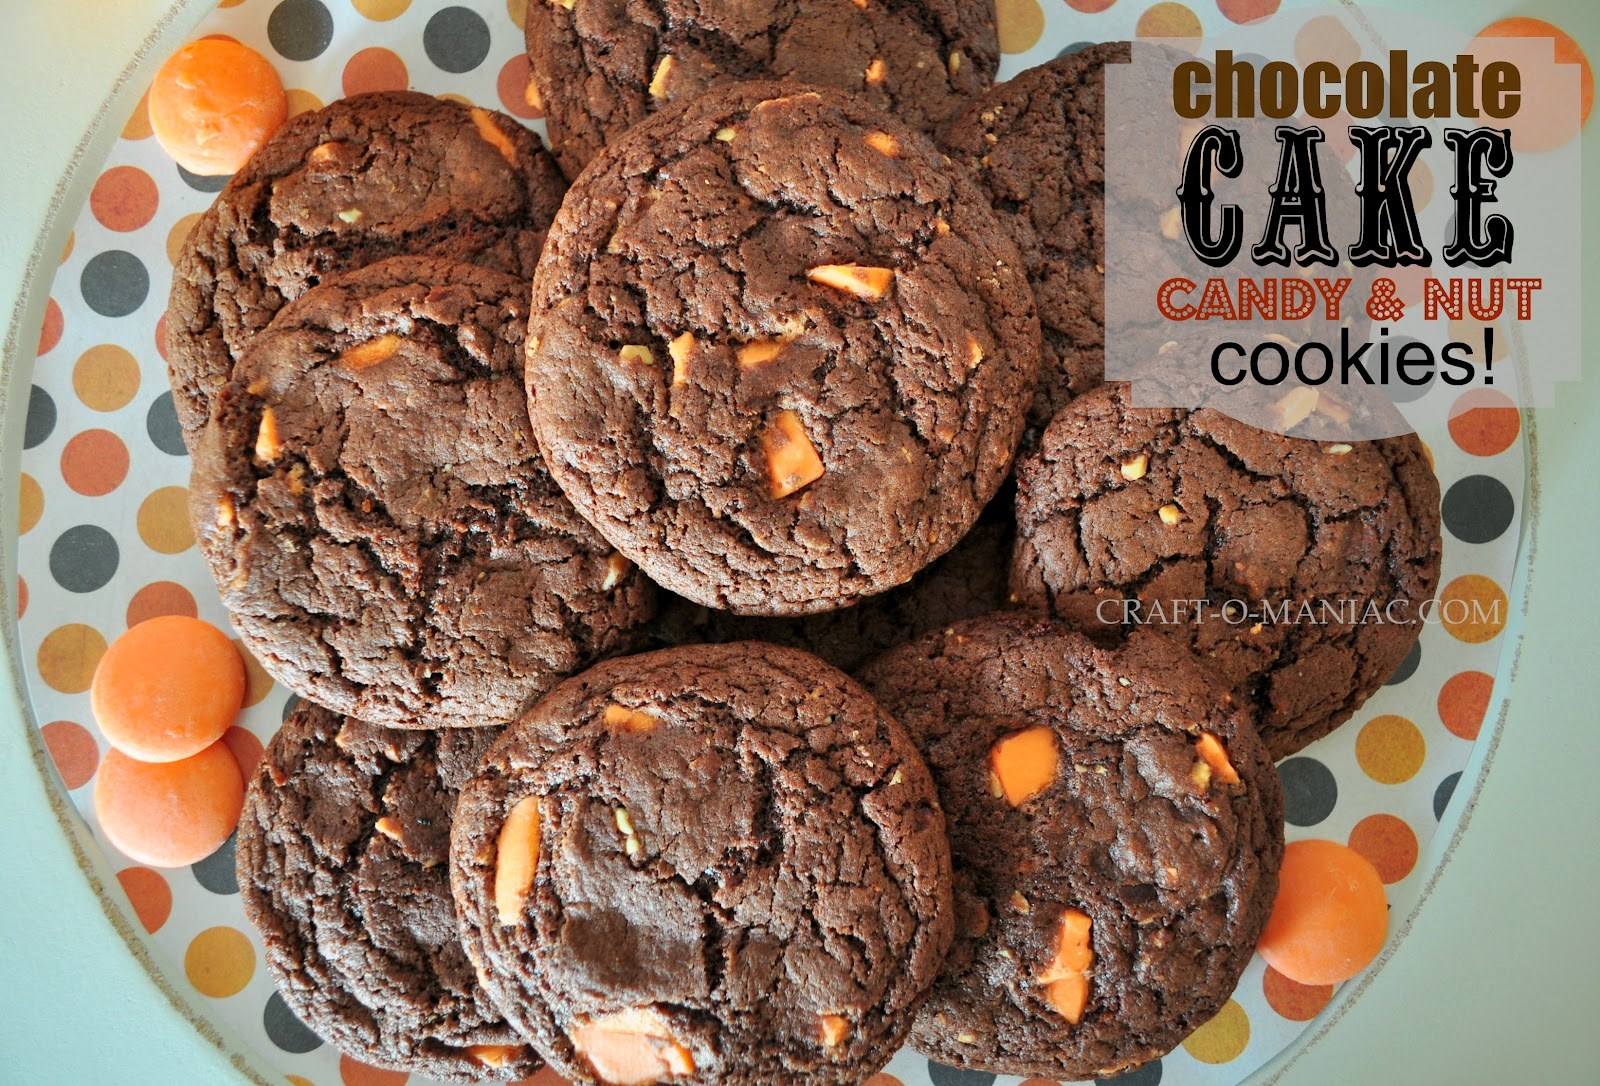 Chocolate CAKE candy & nut Cookies - Craft-O-Maniac